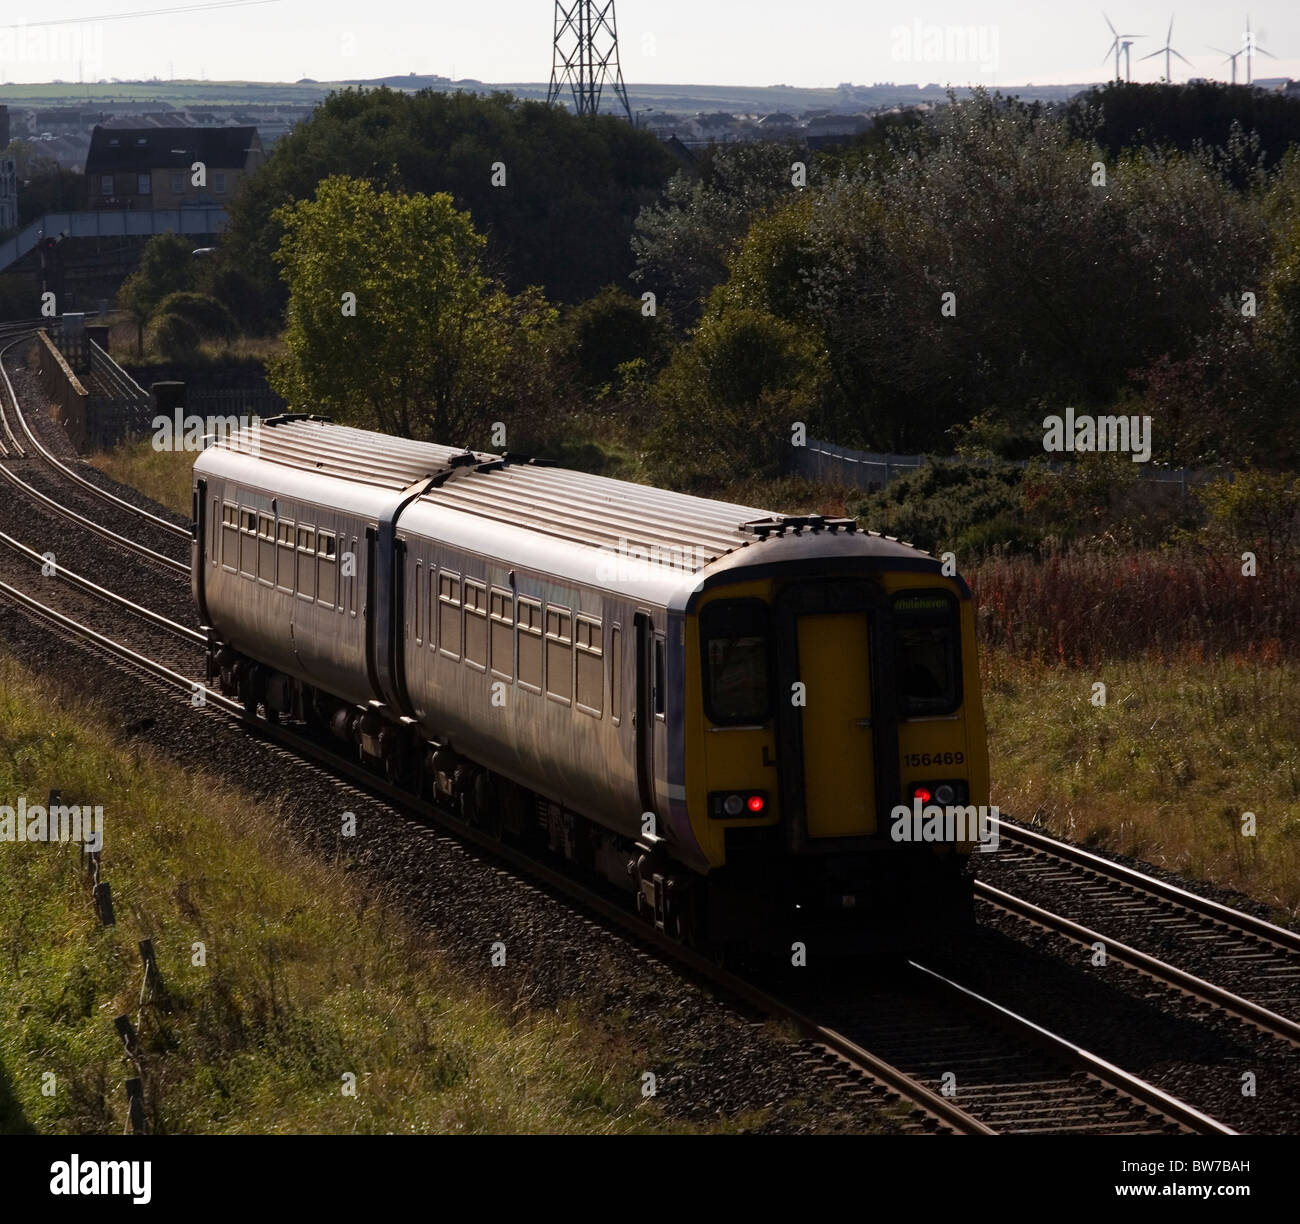 Northern Rail train at Workington, Cumbria, England - Stock Image